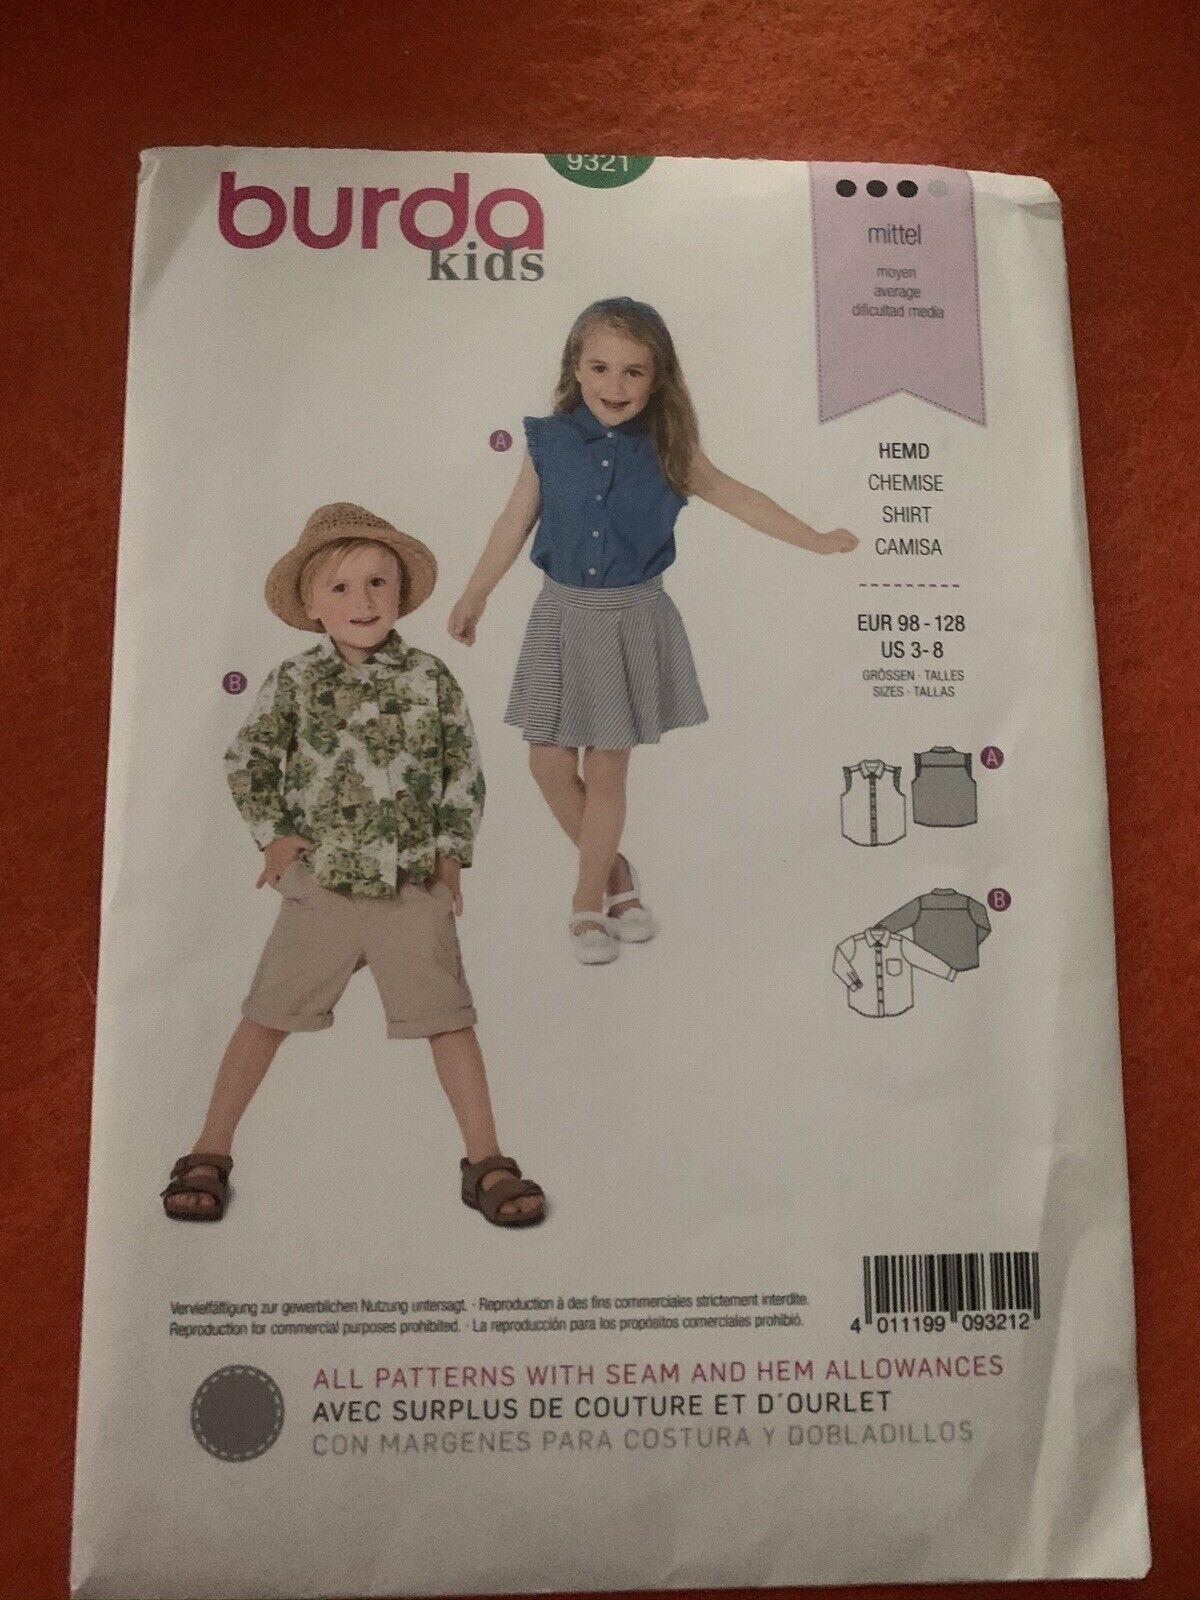 Burda 9381 Sewing Pattern Kids Bathrobe Poncho Unisex For Sale Online Ebay